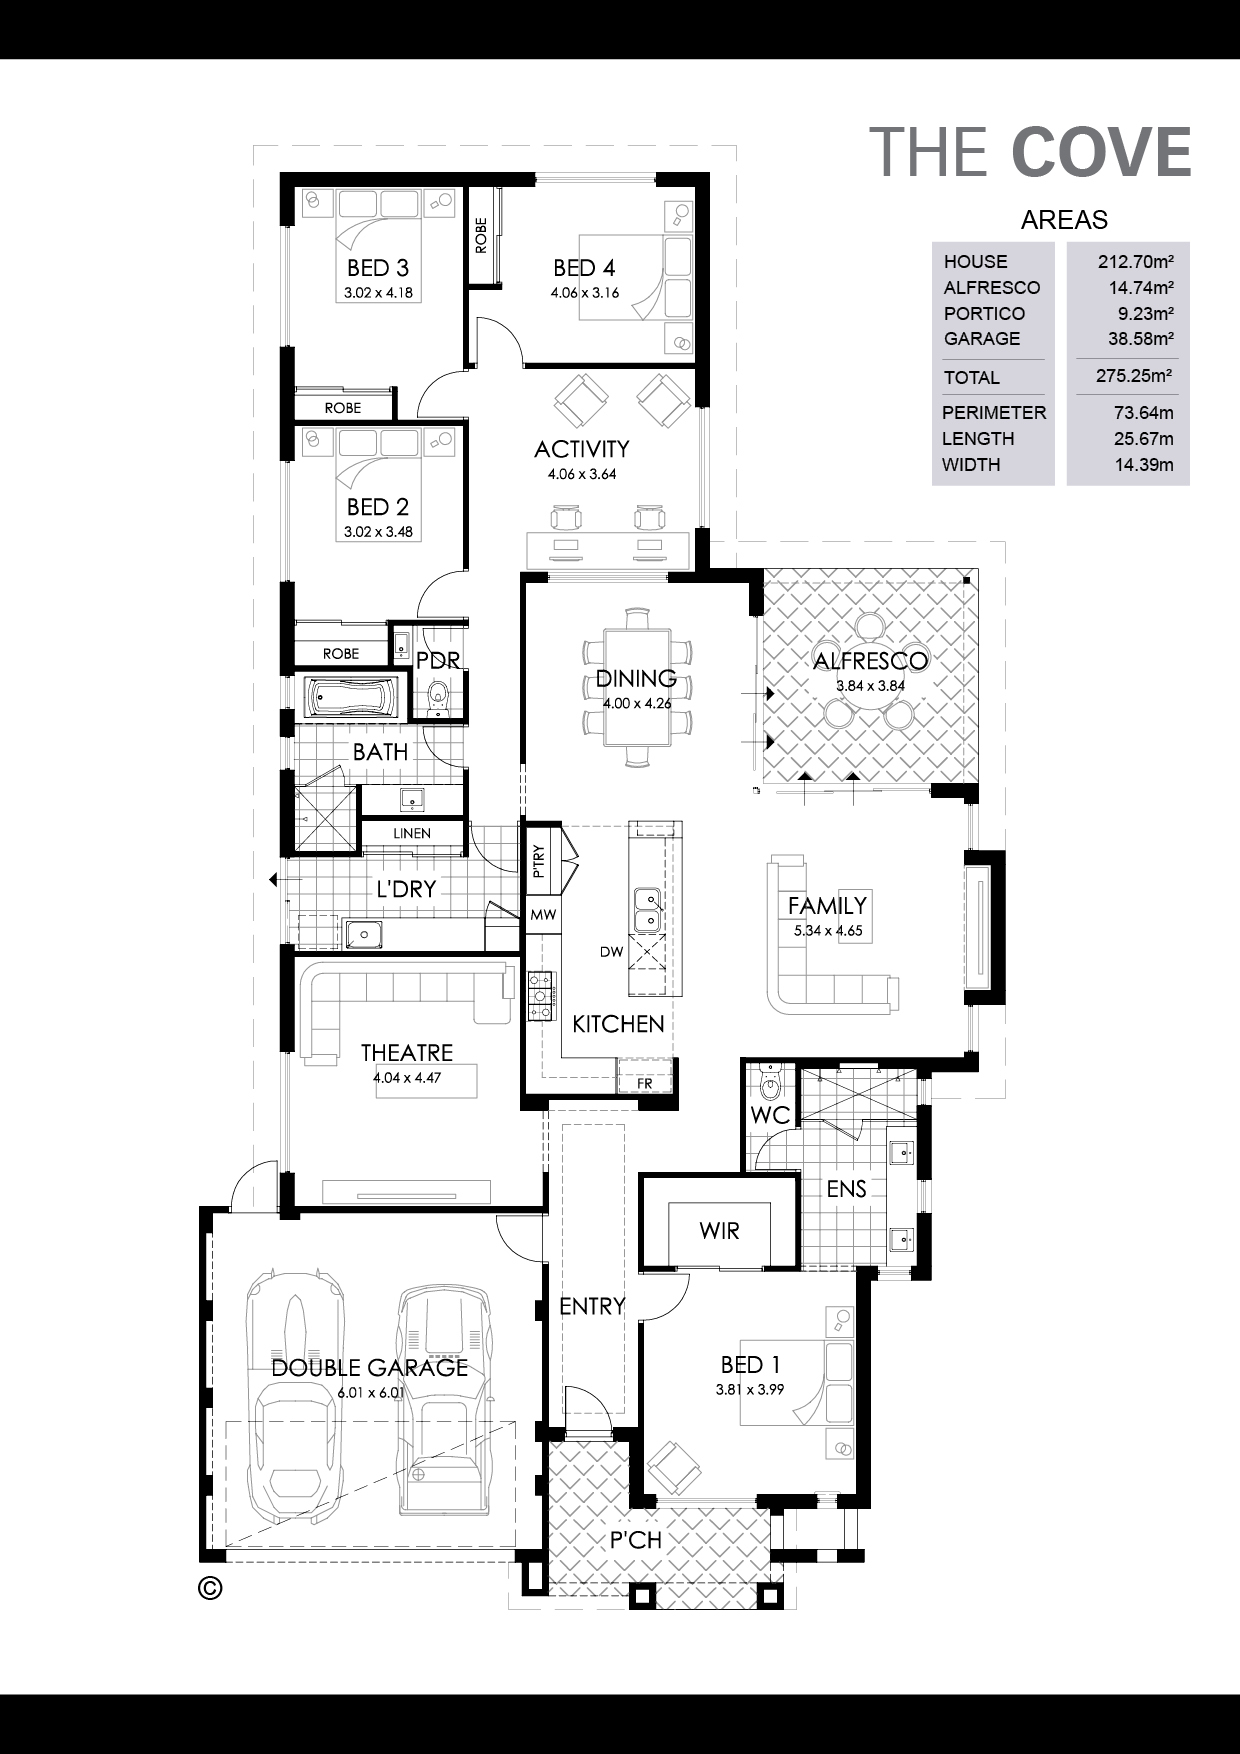 The Cove Floorplan